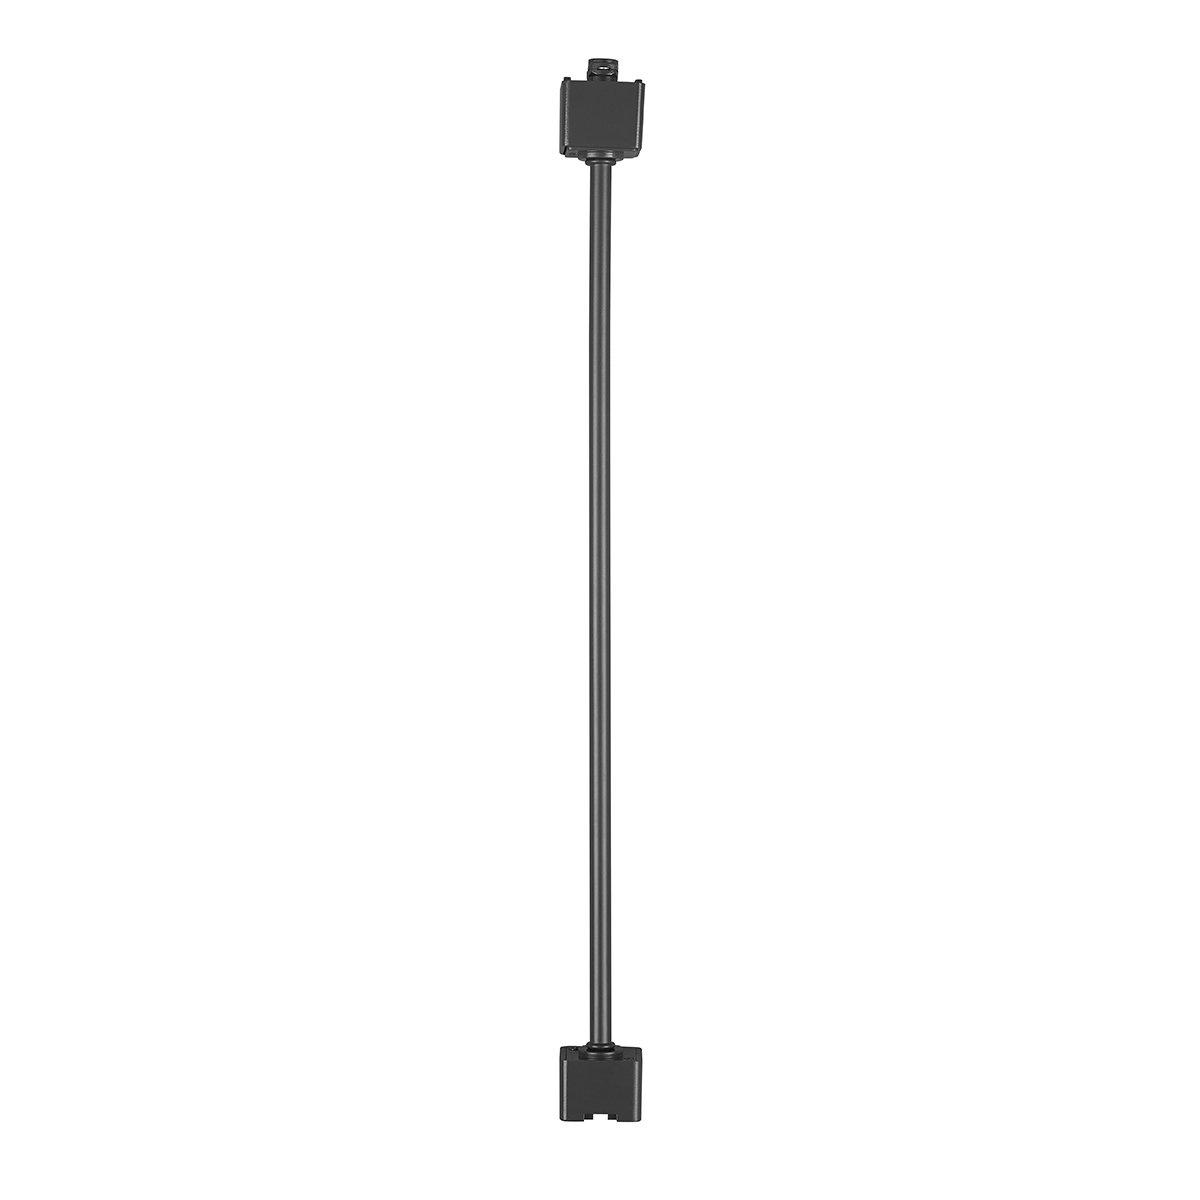 WAC Lighting H36-BK H Track 36'' Extension for Line Voltage H-Track Fixture, Black